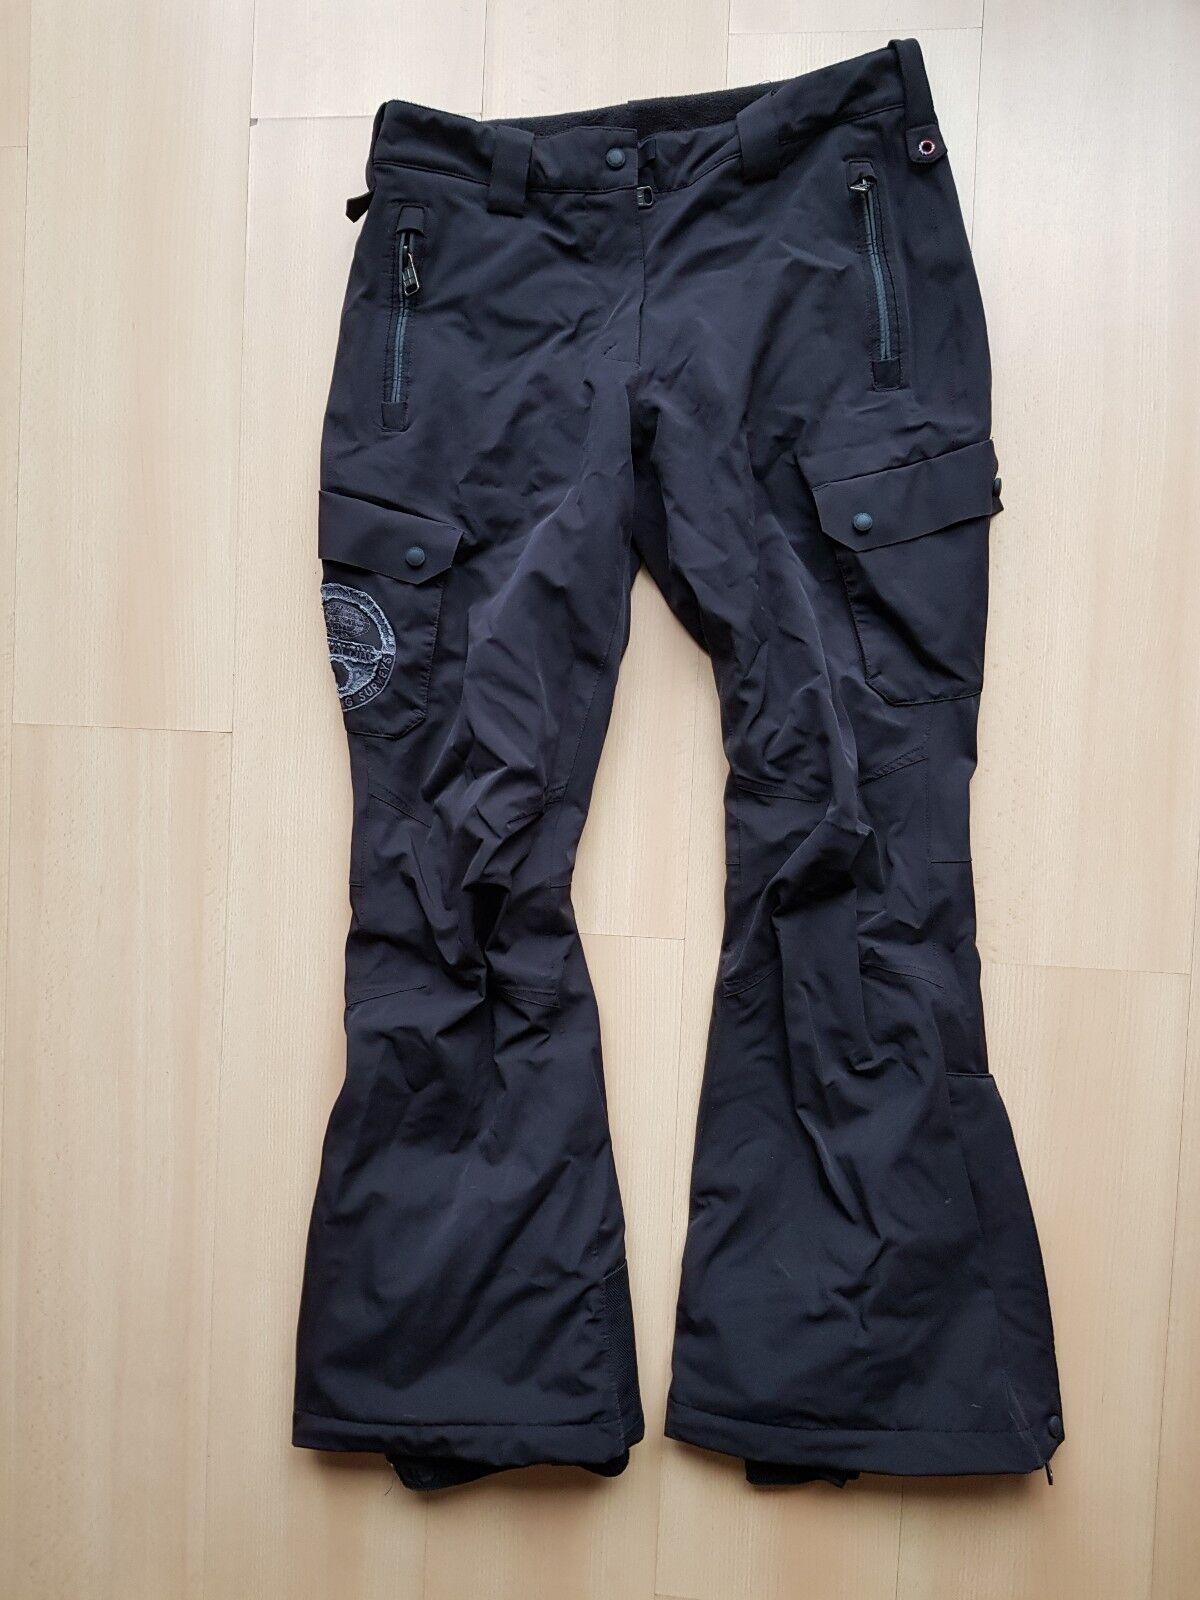 NAPAPIJRI Ski Snowboard Pants Insulated Trousers Women's Size L